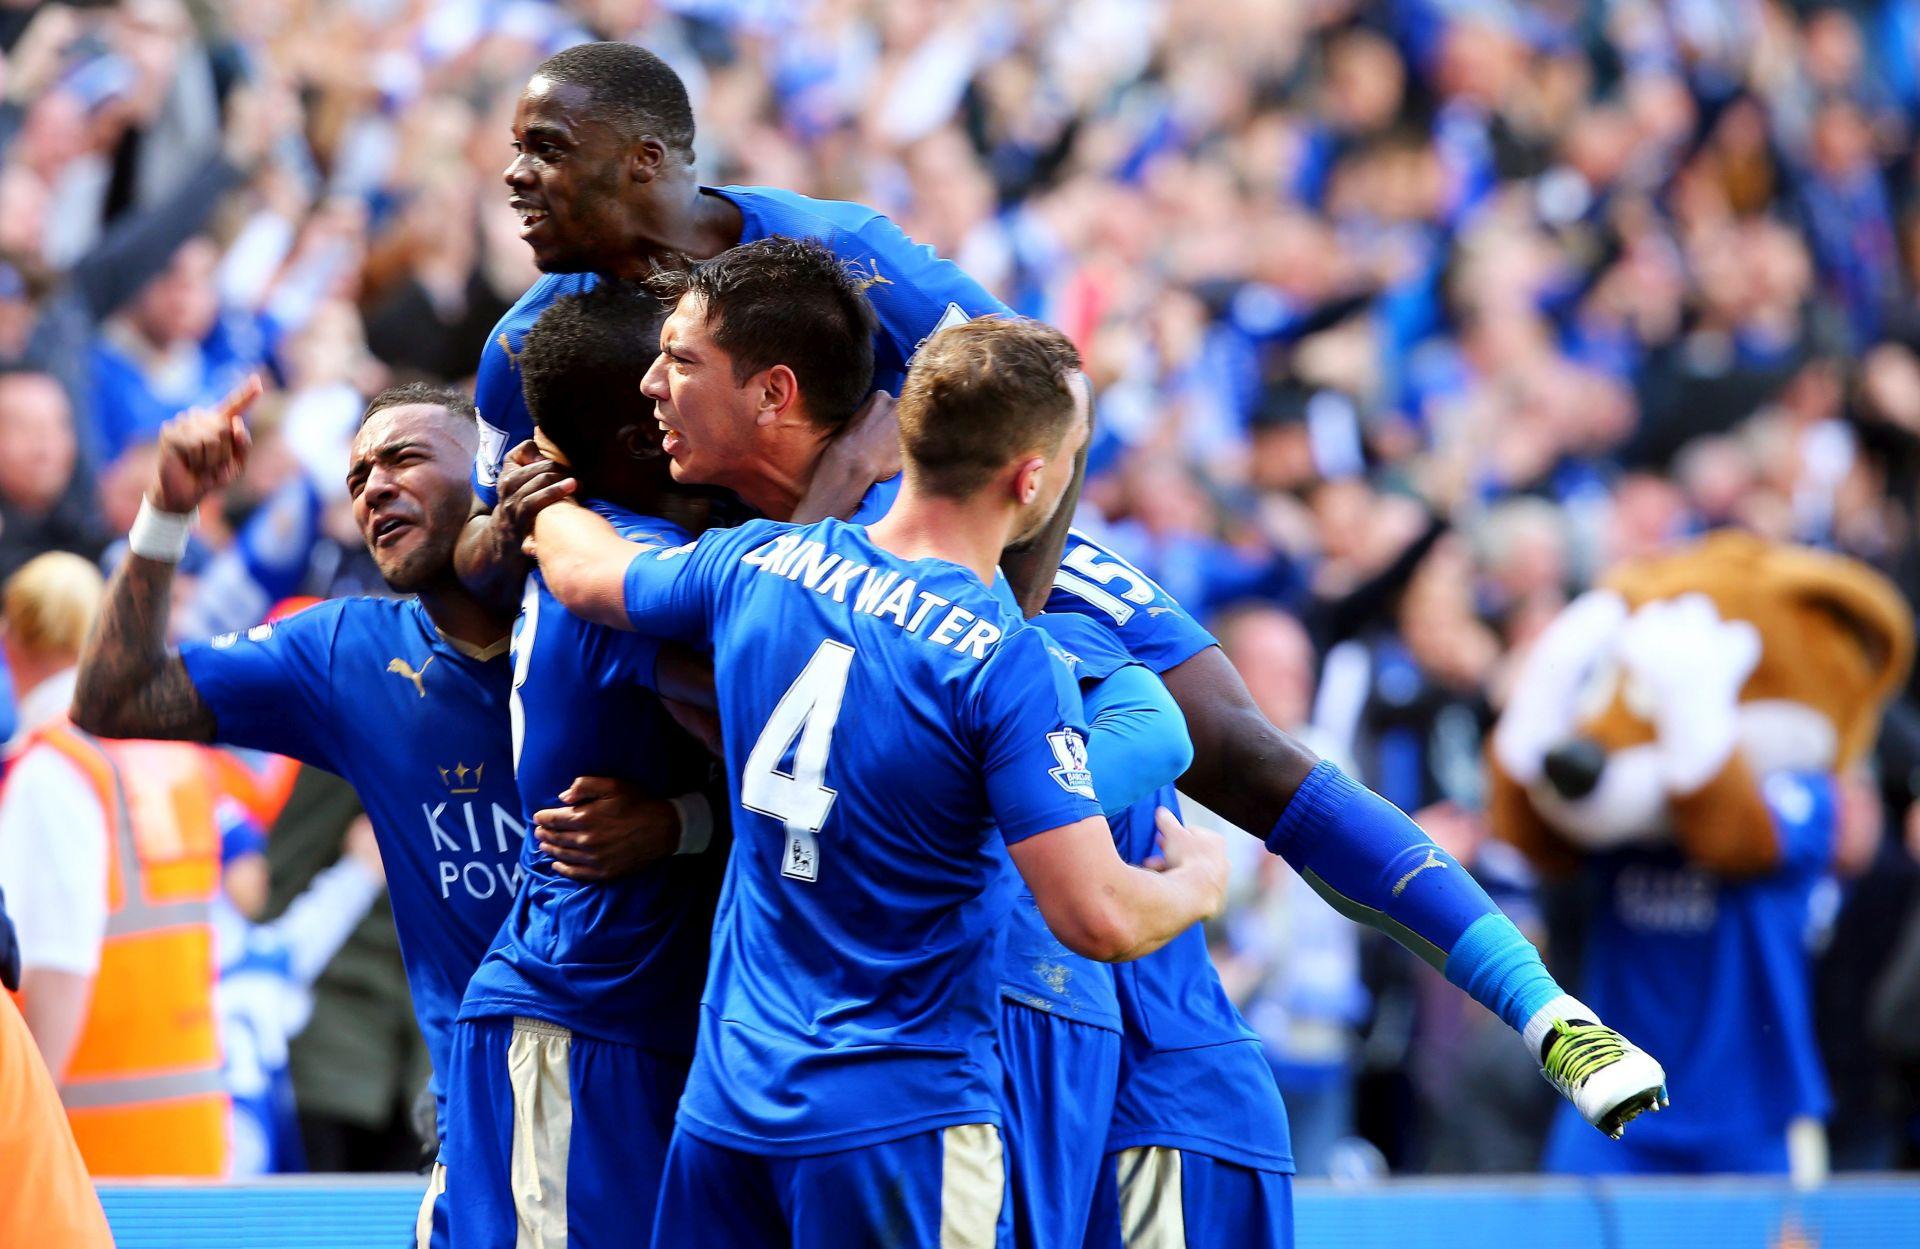 Leicester prvak Engleske nakon što je Tottenham remizirao protiv Chelseaja